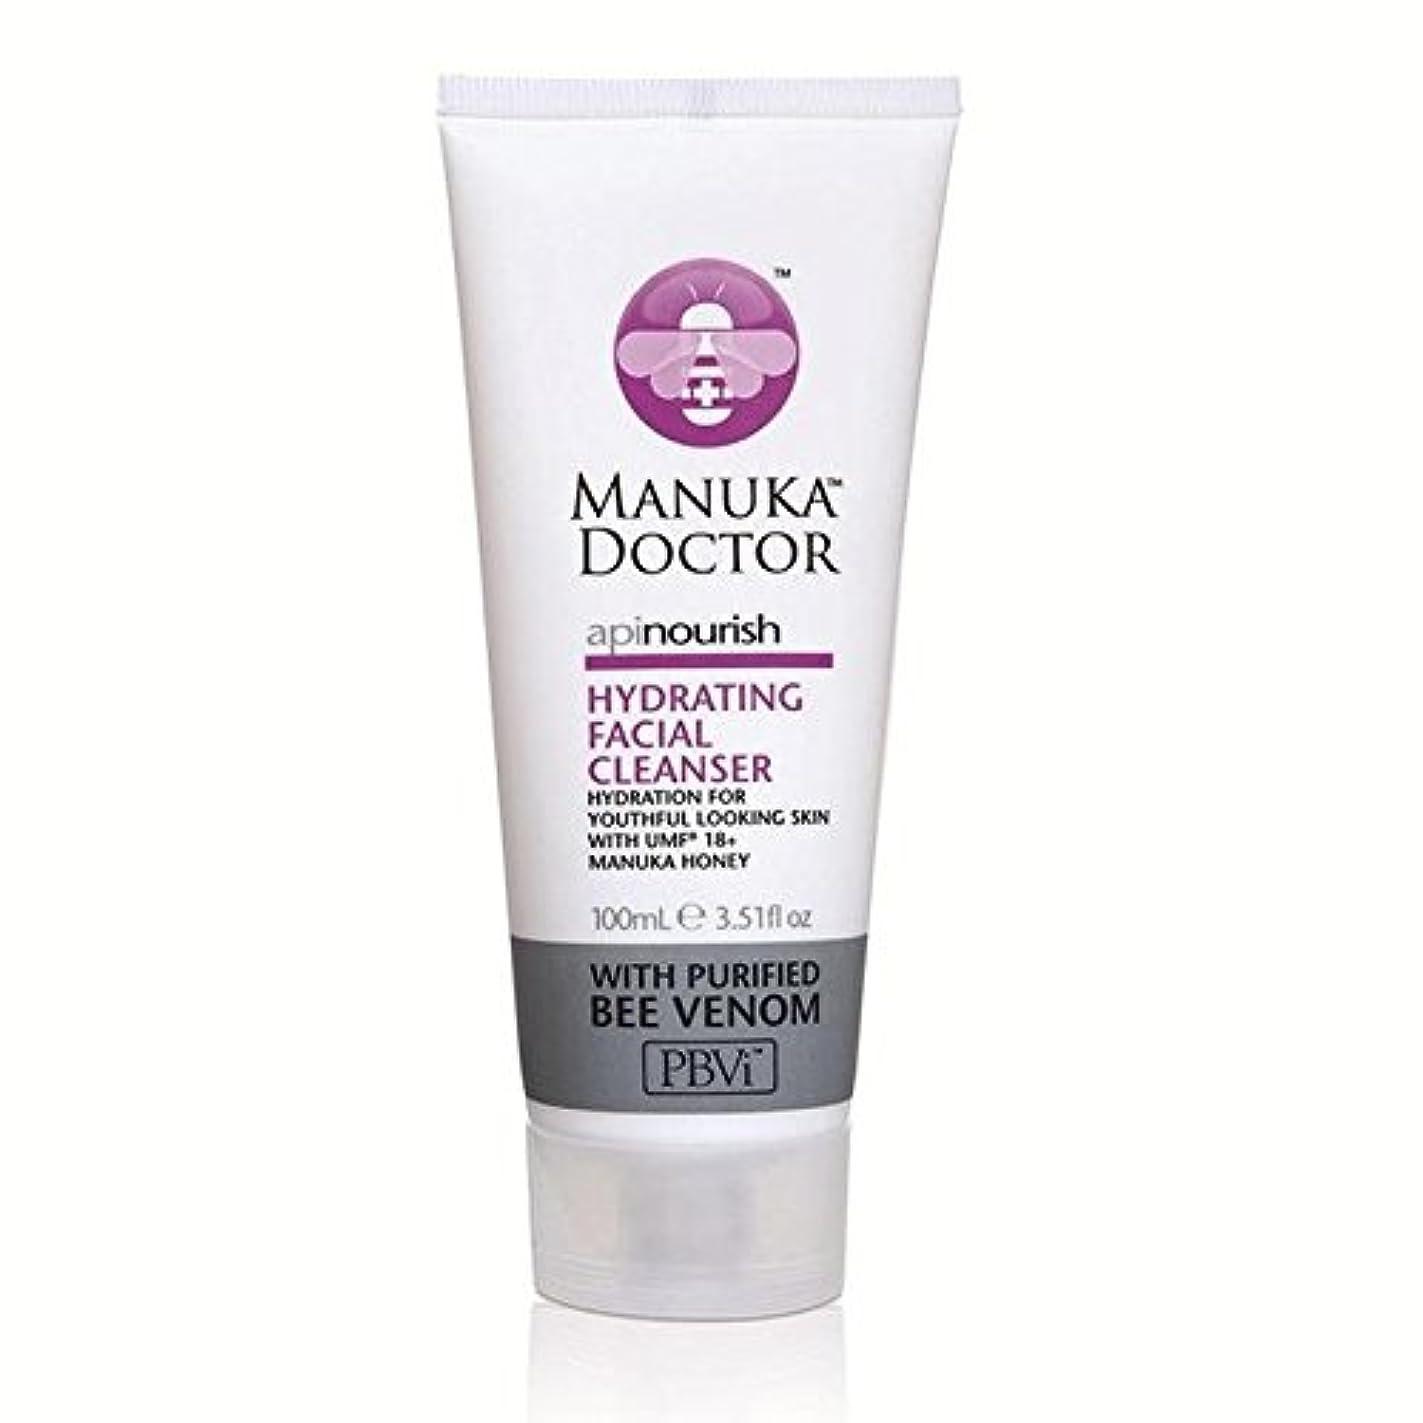 Manuka Doctor Api Nourish Hydrating Facial Cleanser 100ml (Pack of 6) - マヌカドクター洗顔料の100ミリリットルの水和養います x6 [並行輸入品]